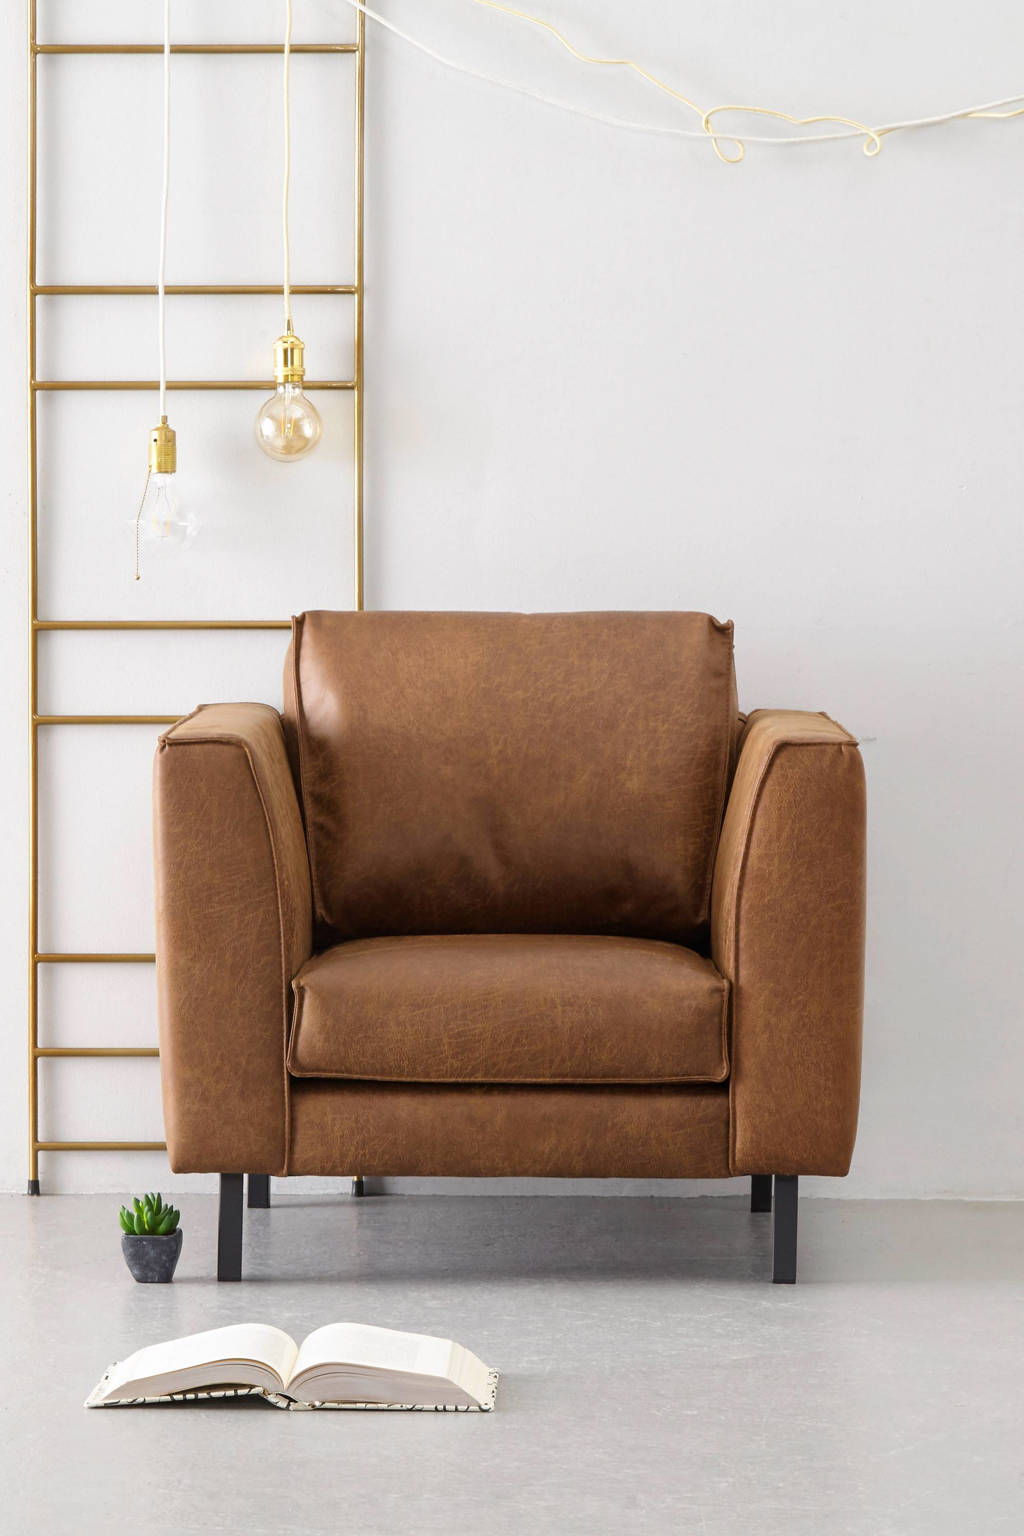 whkmp's own eco-leren fauteuil Rio, Cognac